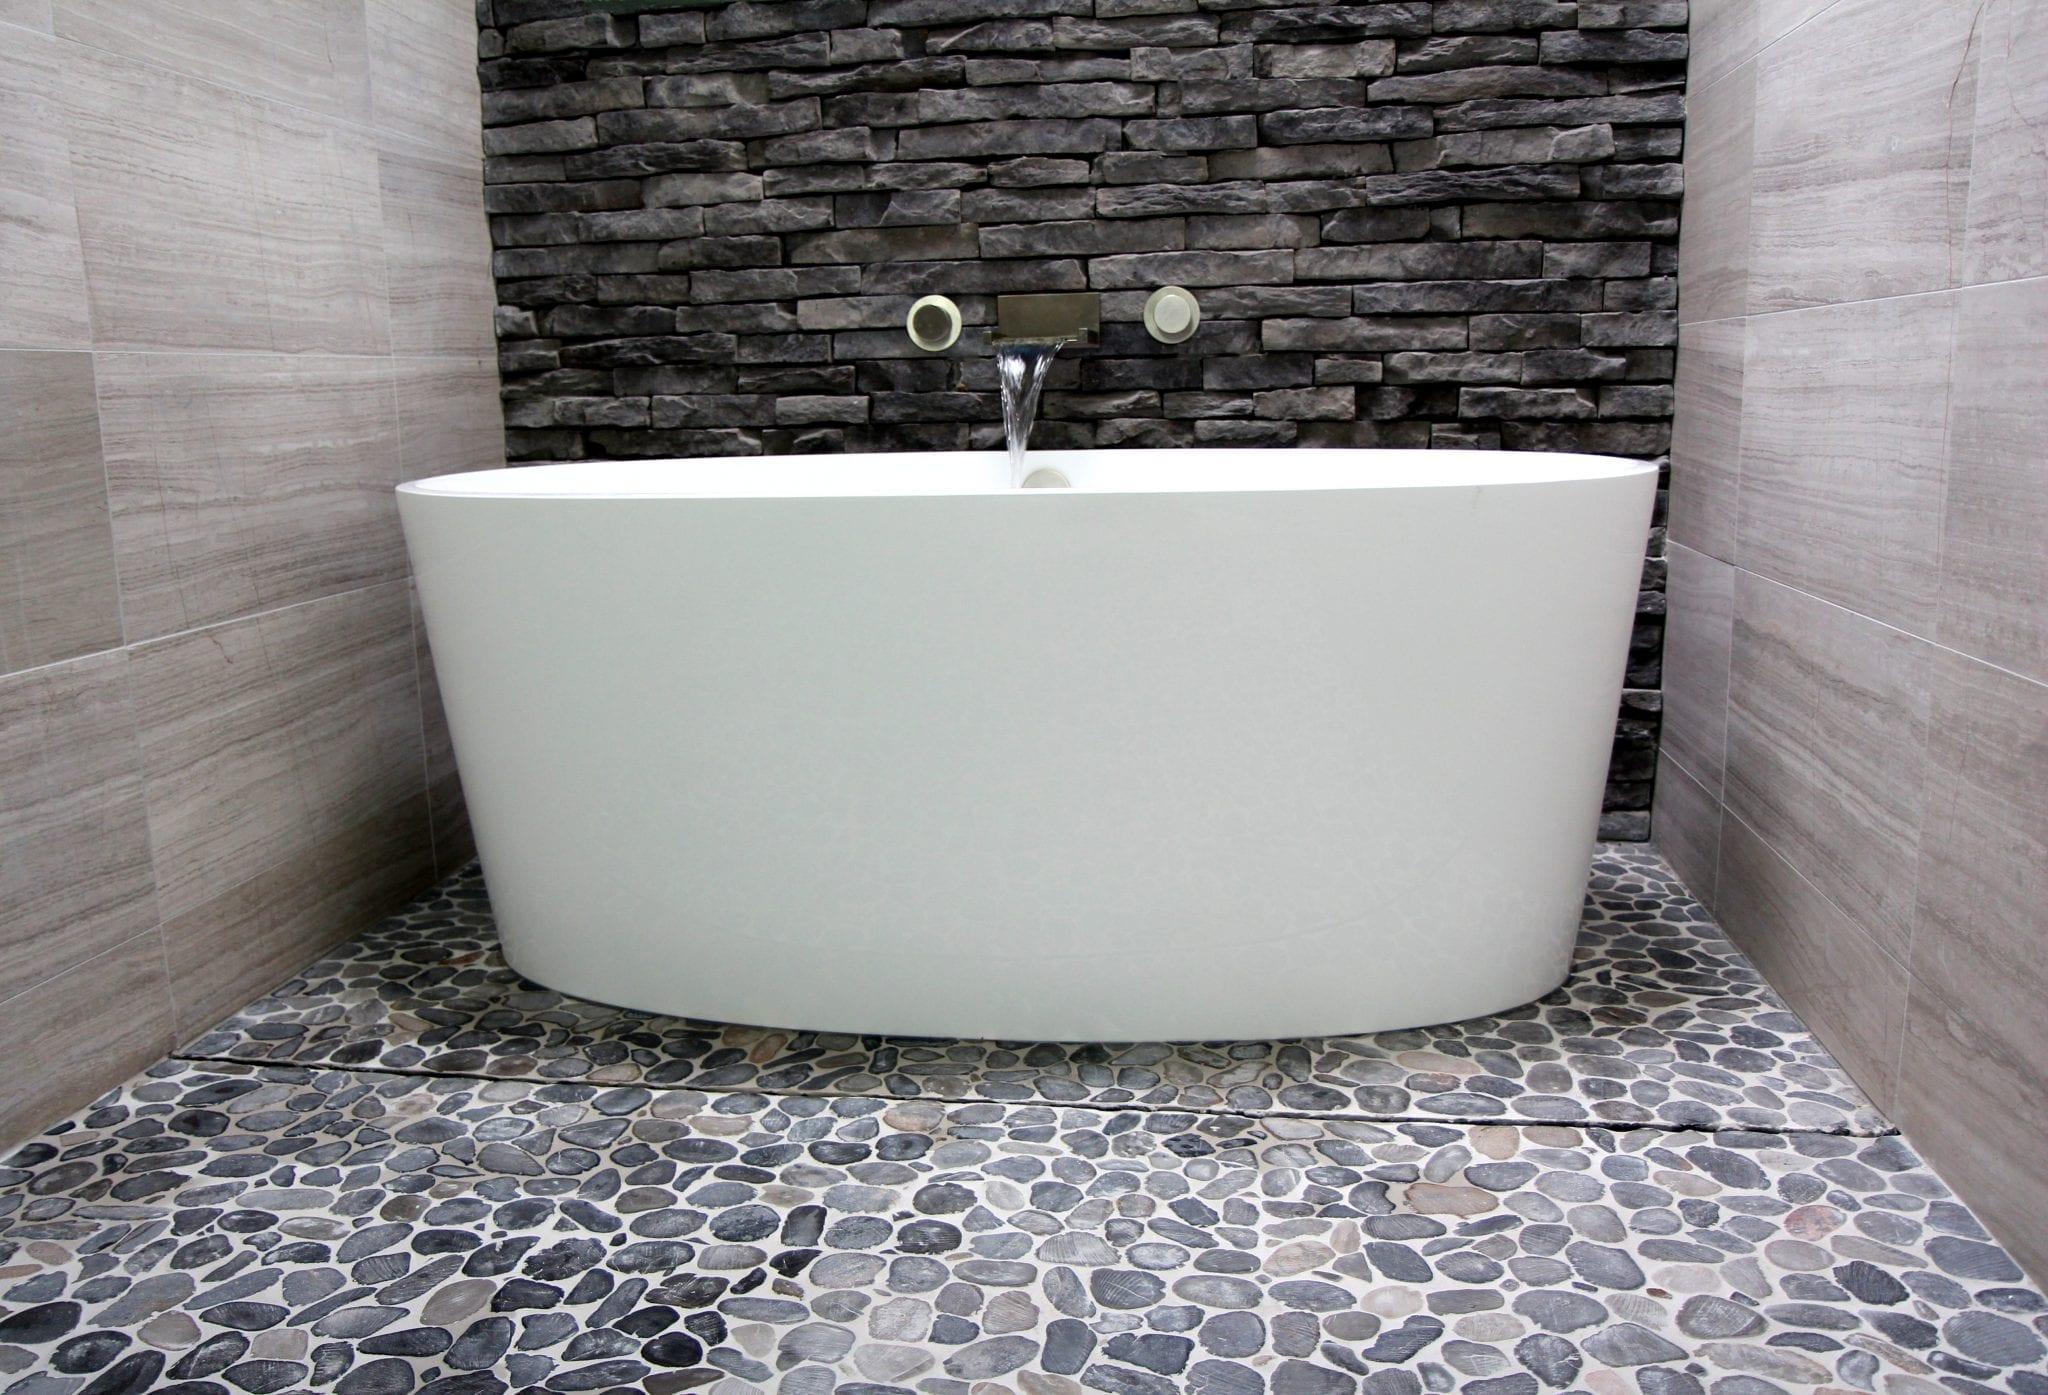 Victoria Albert IOS Bathtub Luxury Bathroom Products